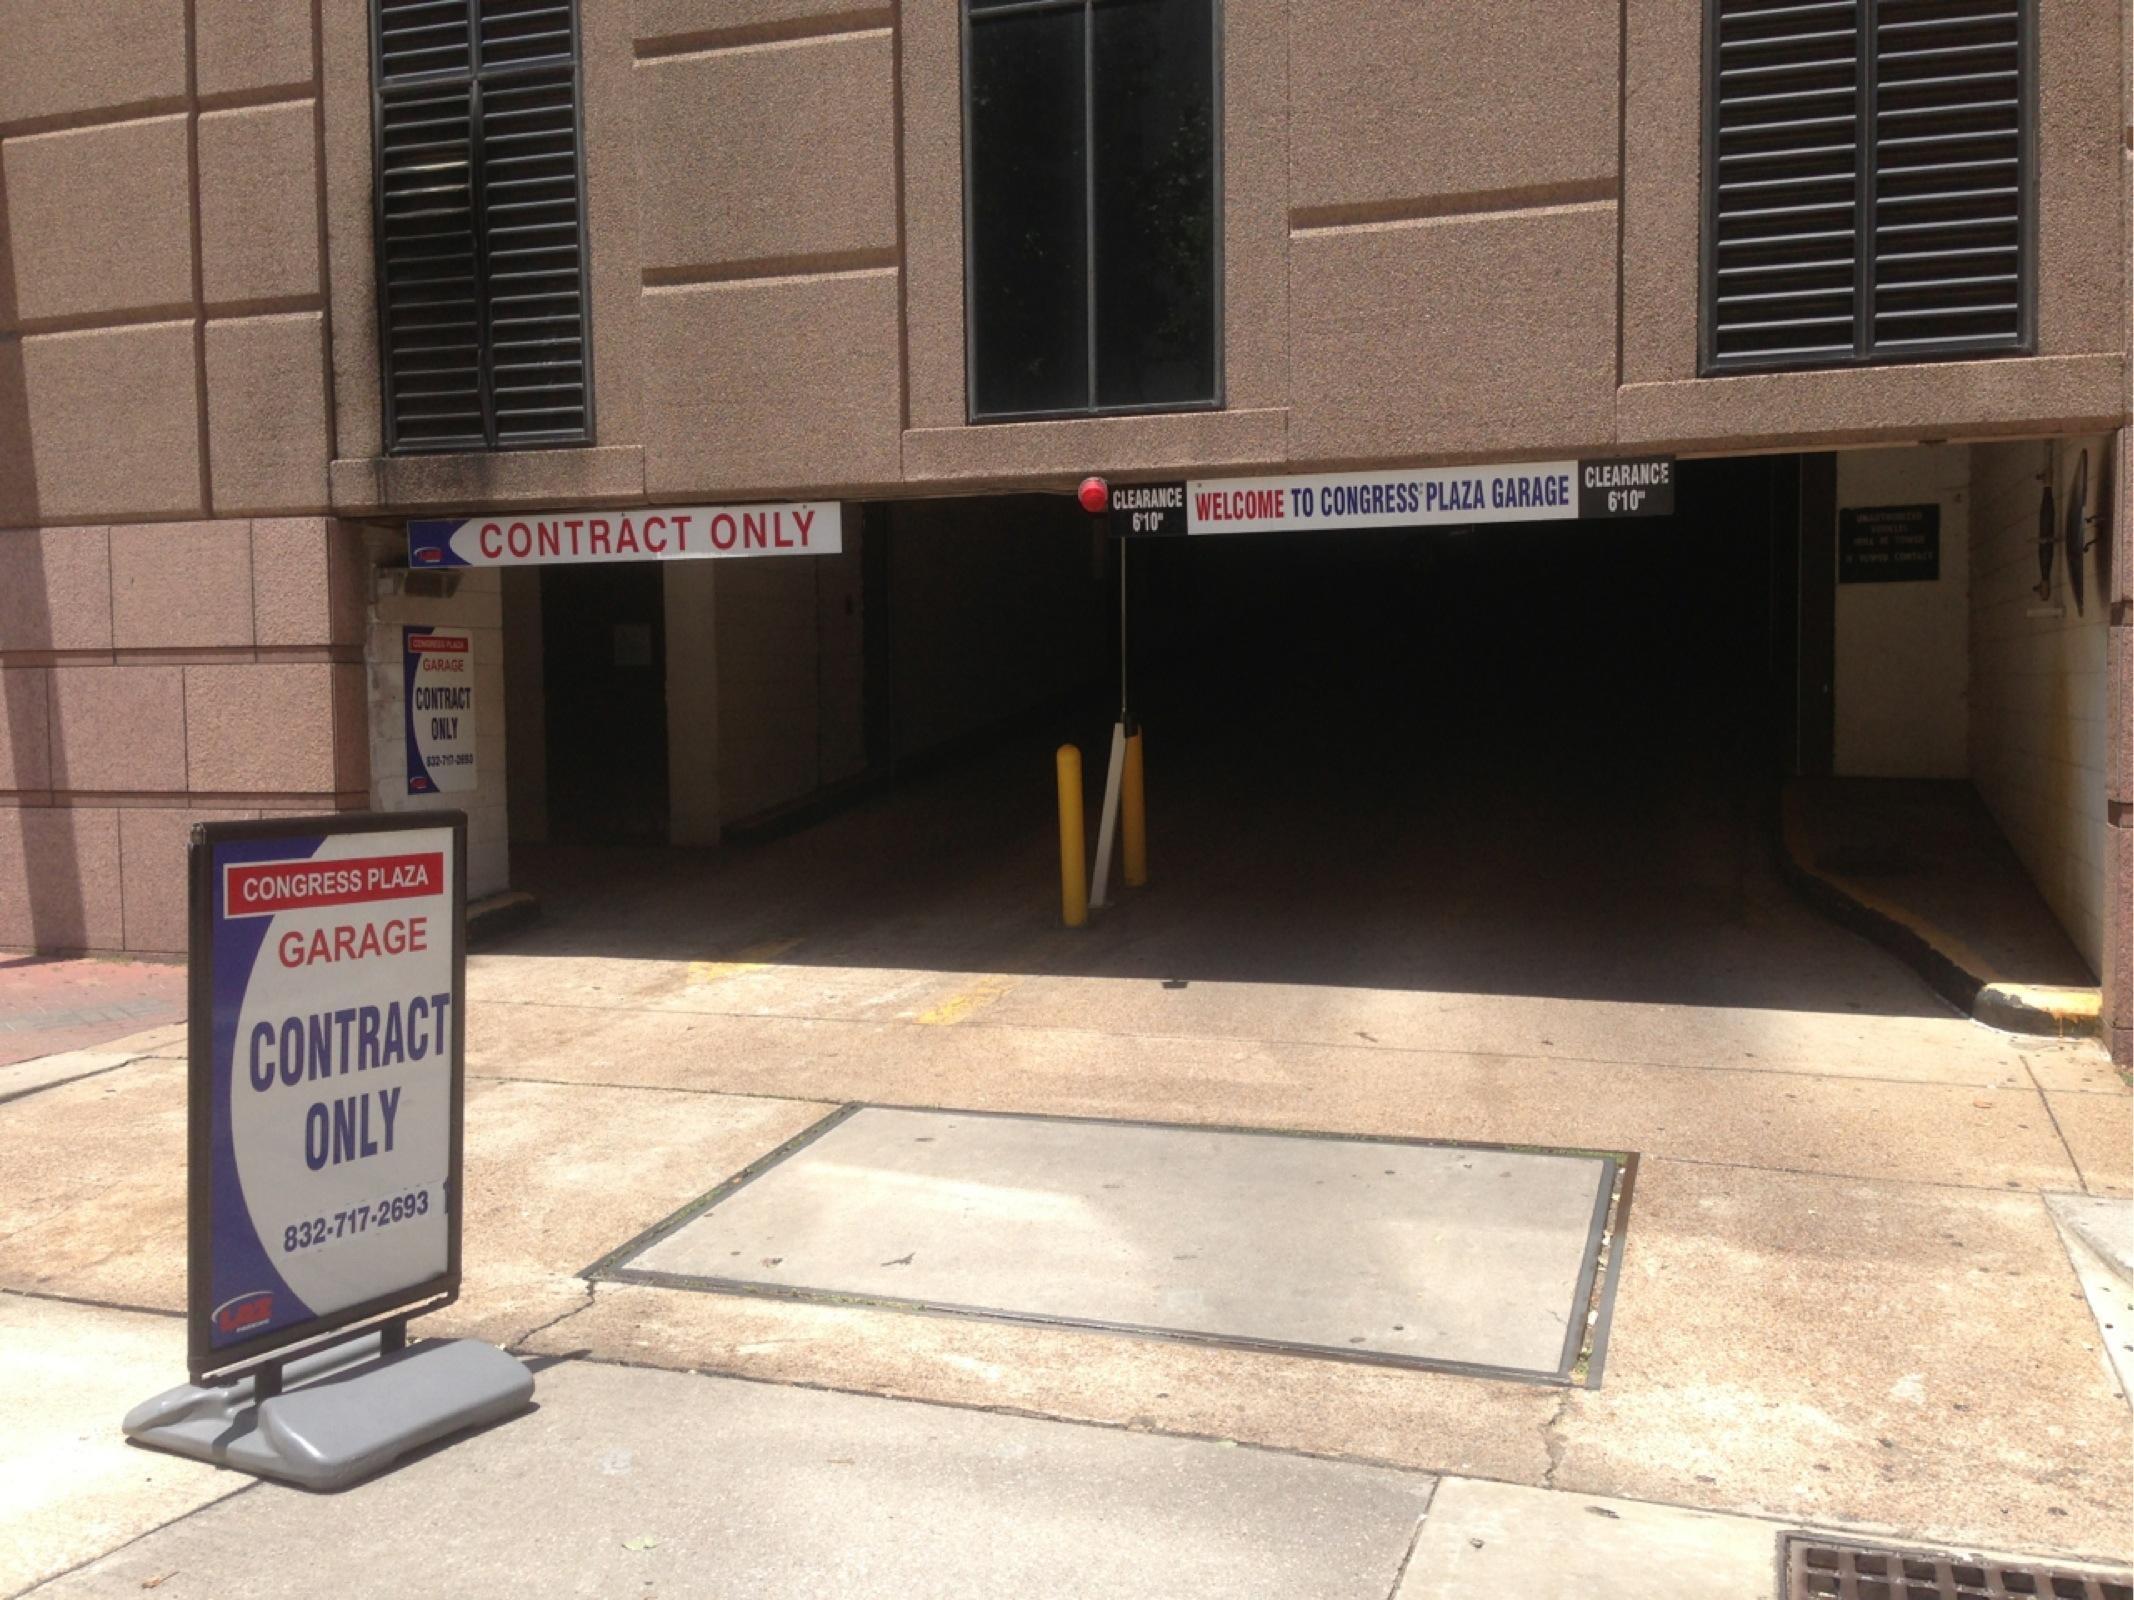 215 Main Street Parking Garage Parking